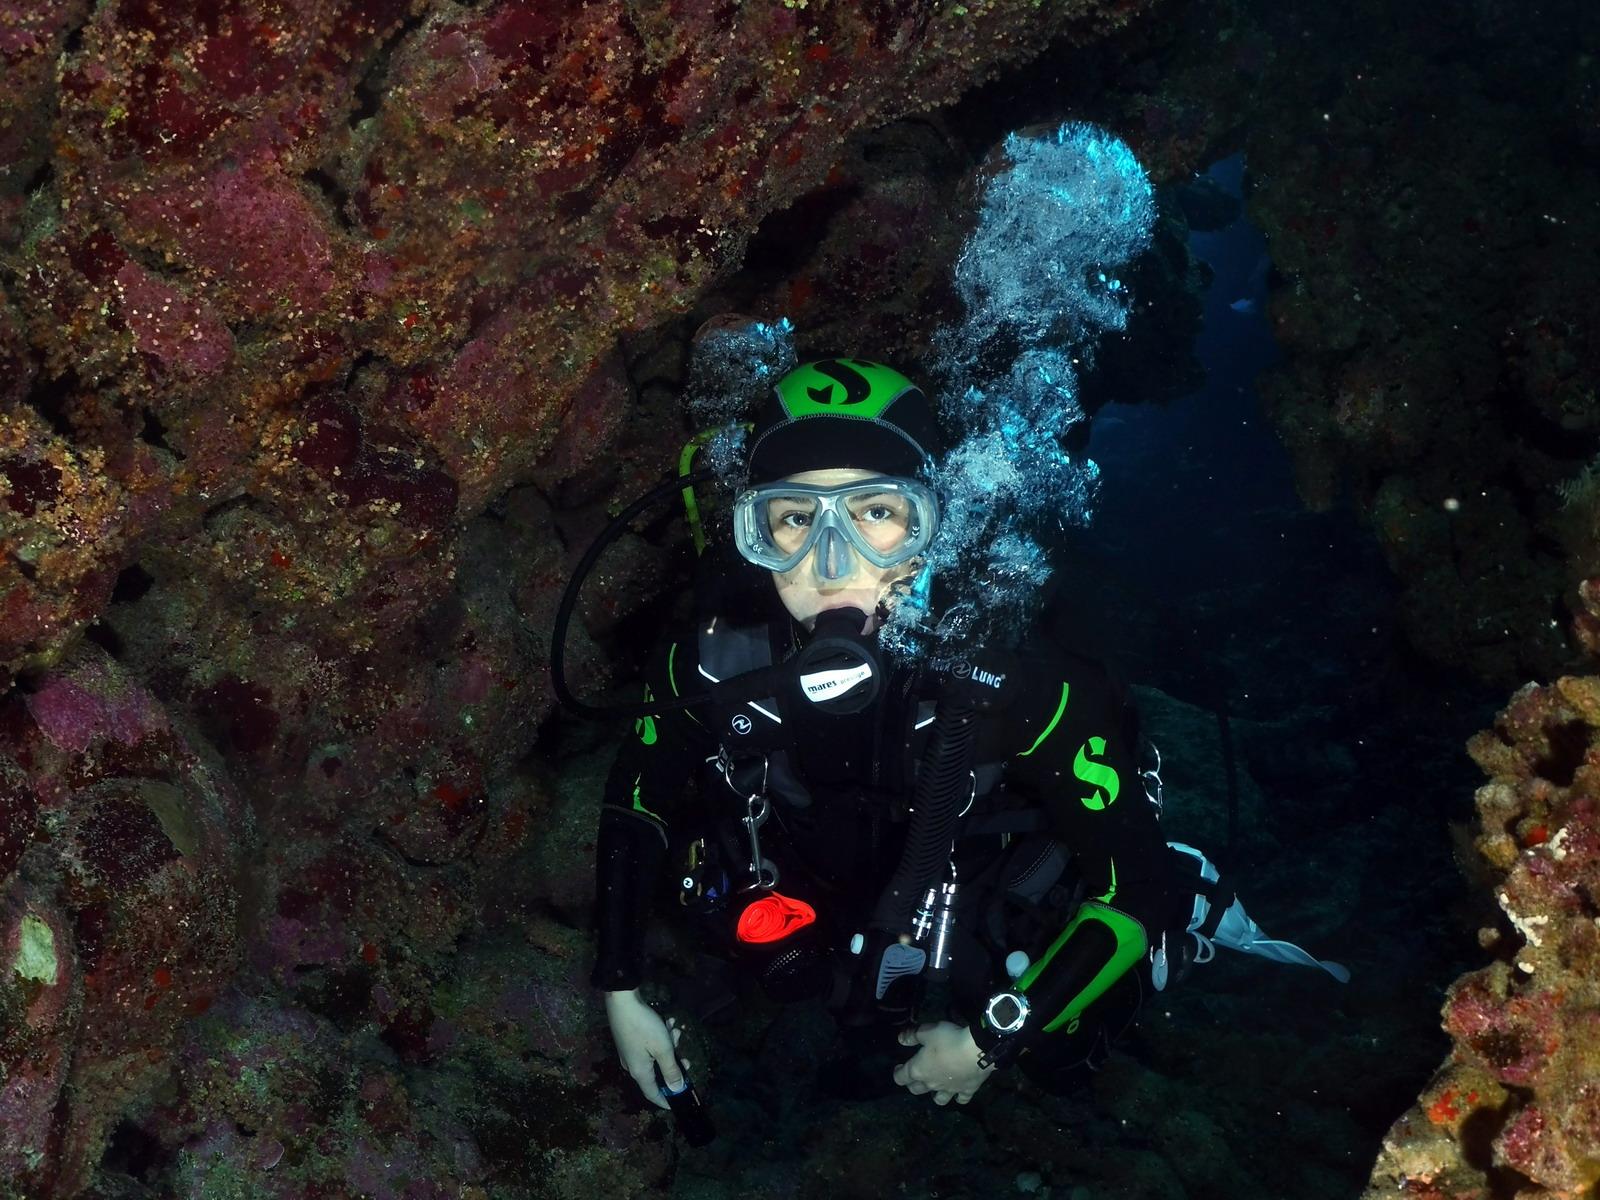 PADI Cavern Diver in einer Grotte.